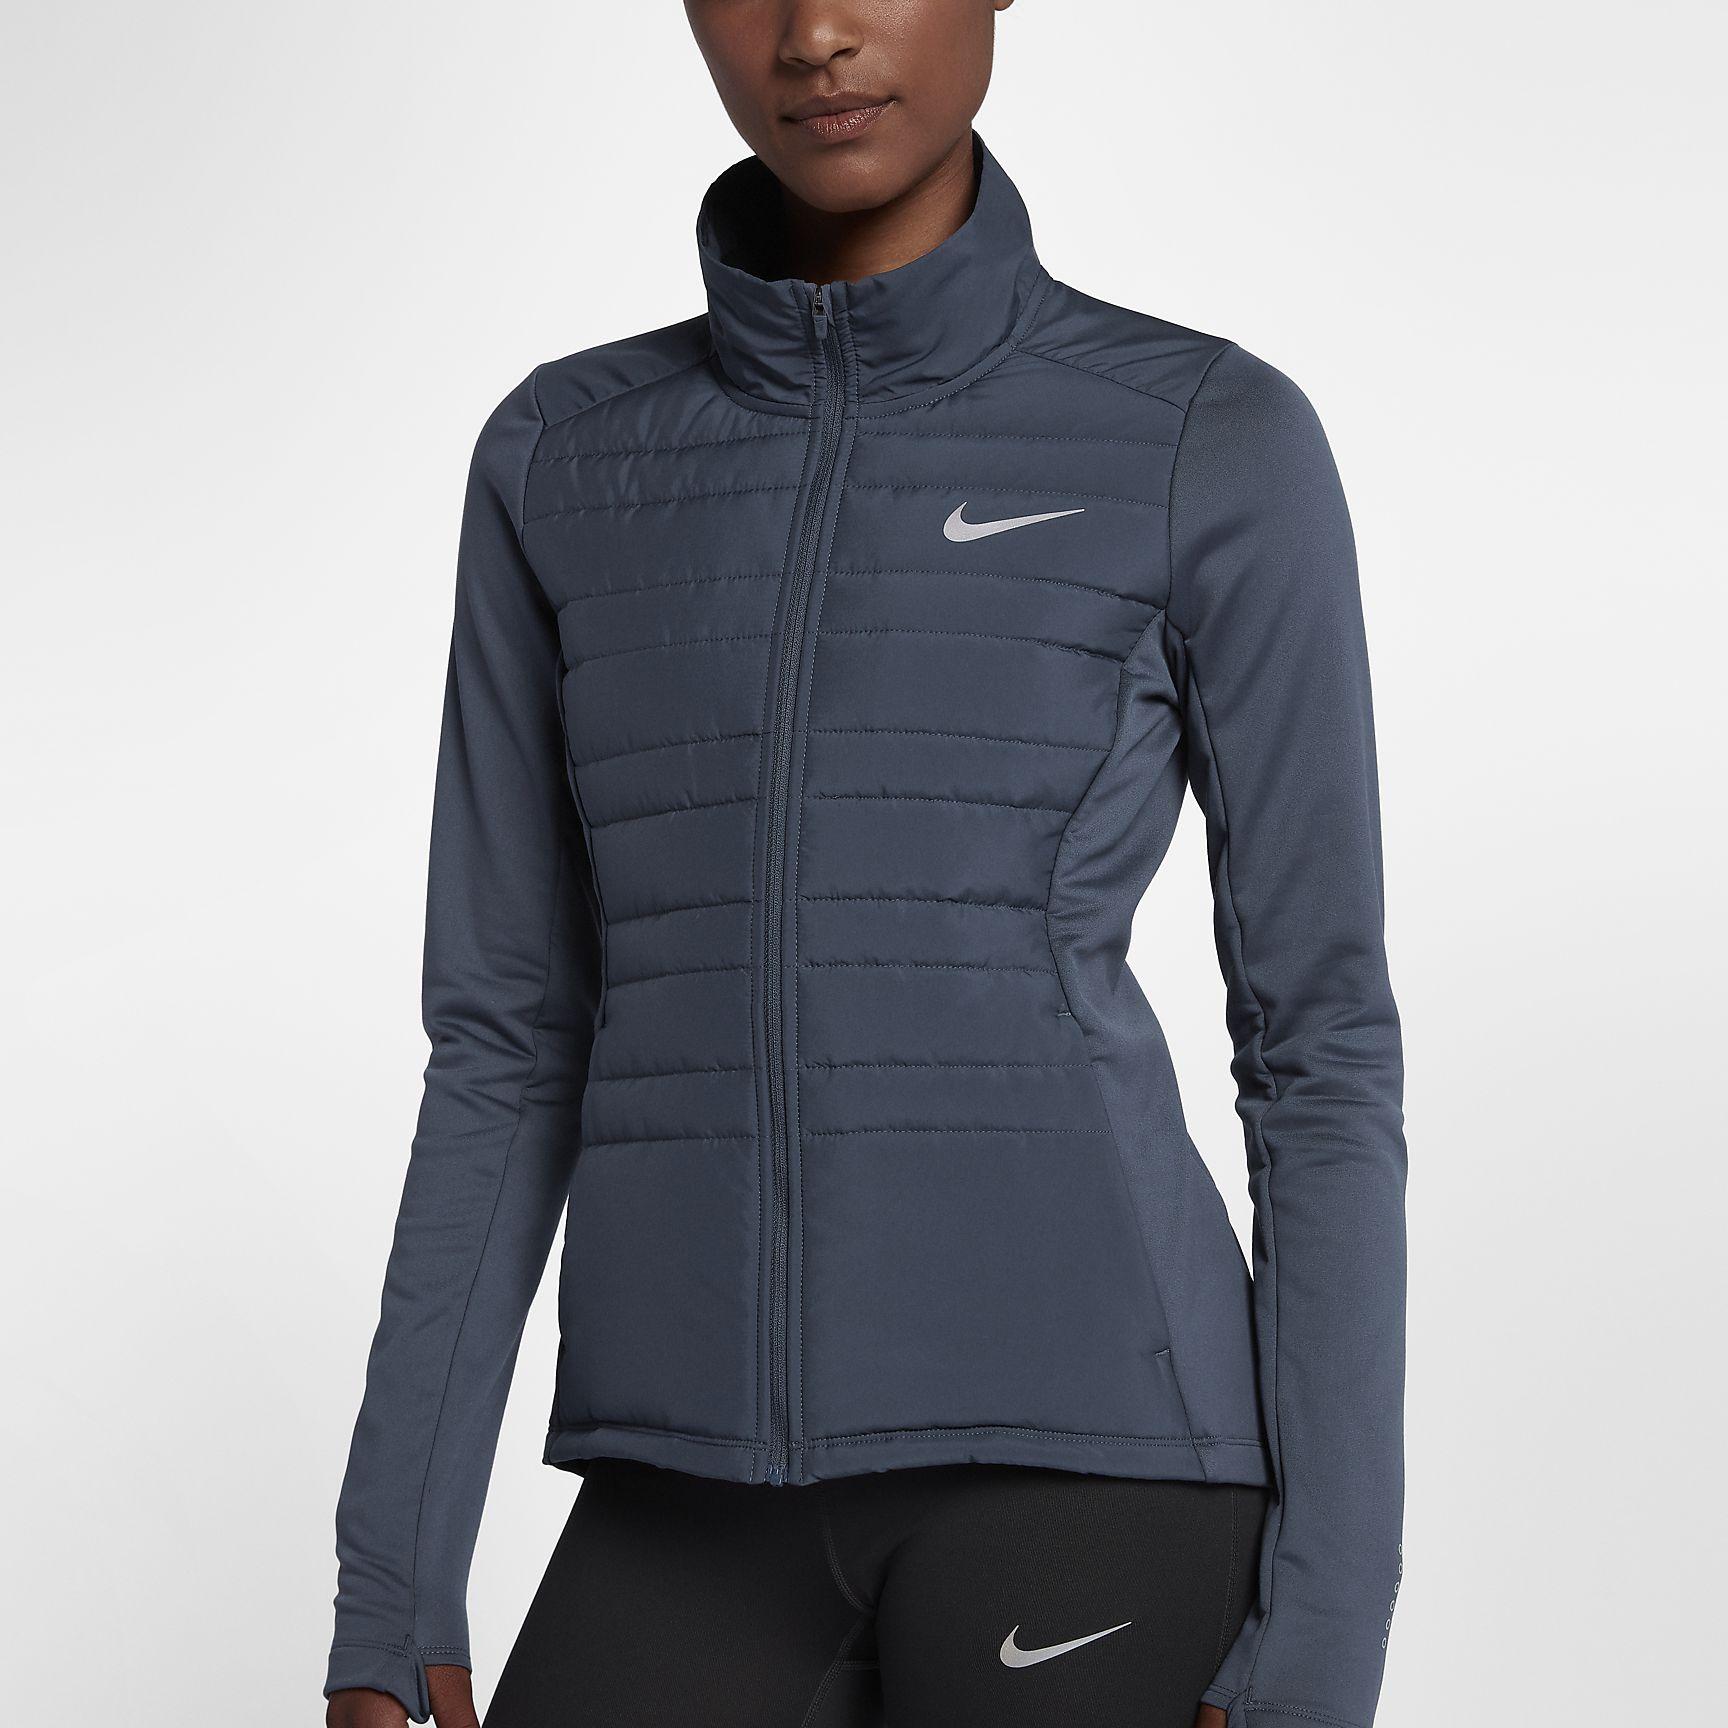 Mencionar Cita Solo haz  Nike Essential Filled Women's Running Jacket | Womens running jacket, Running  jacket, Jackets